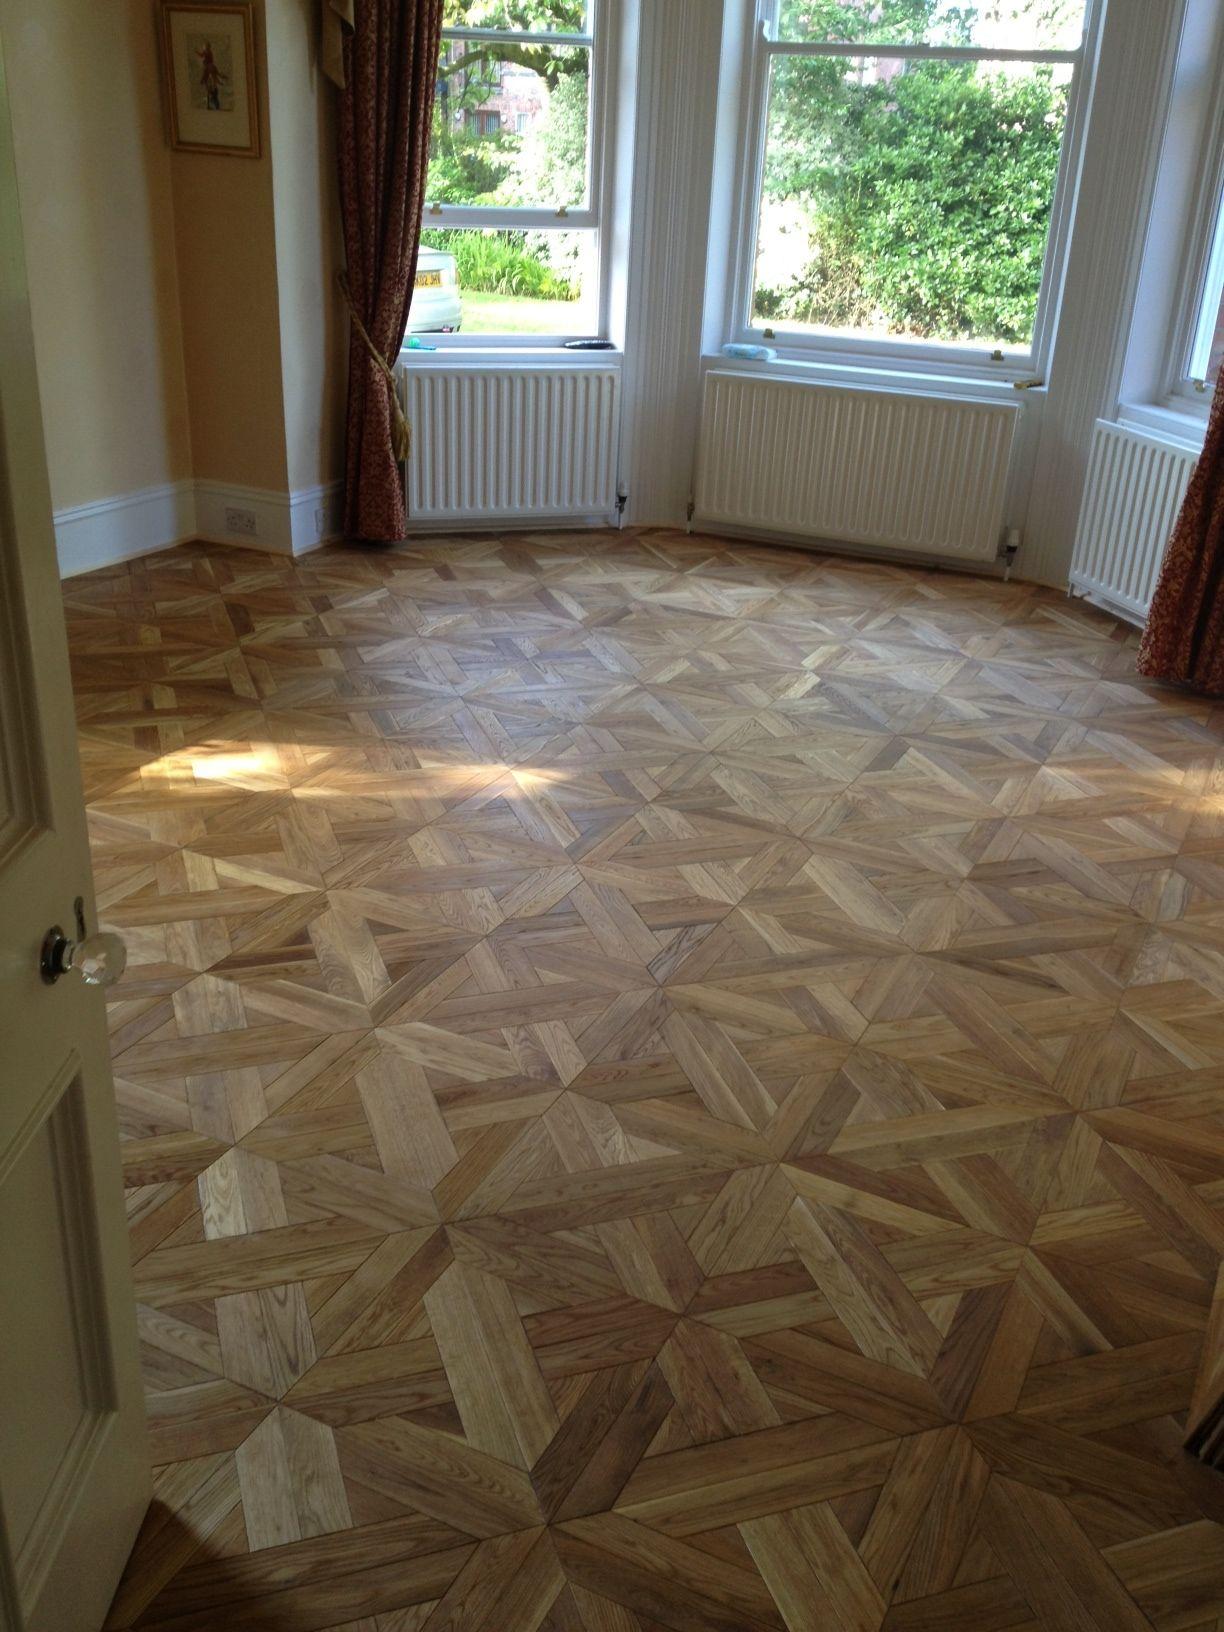 Engineered oak square parquet flooring 14 x 420 x 420mm httpwww engineered oak square parquet flooring 14 x 420 x 420mm http dailygadgetfo Choice Image